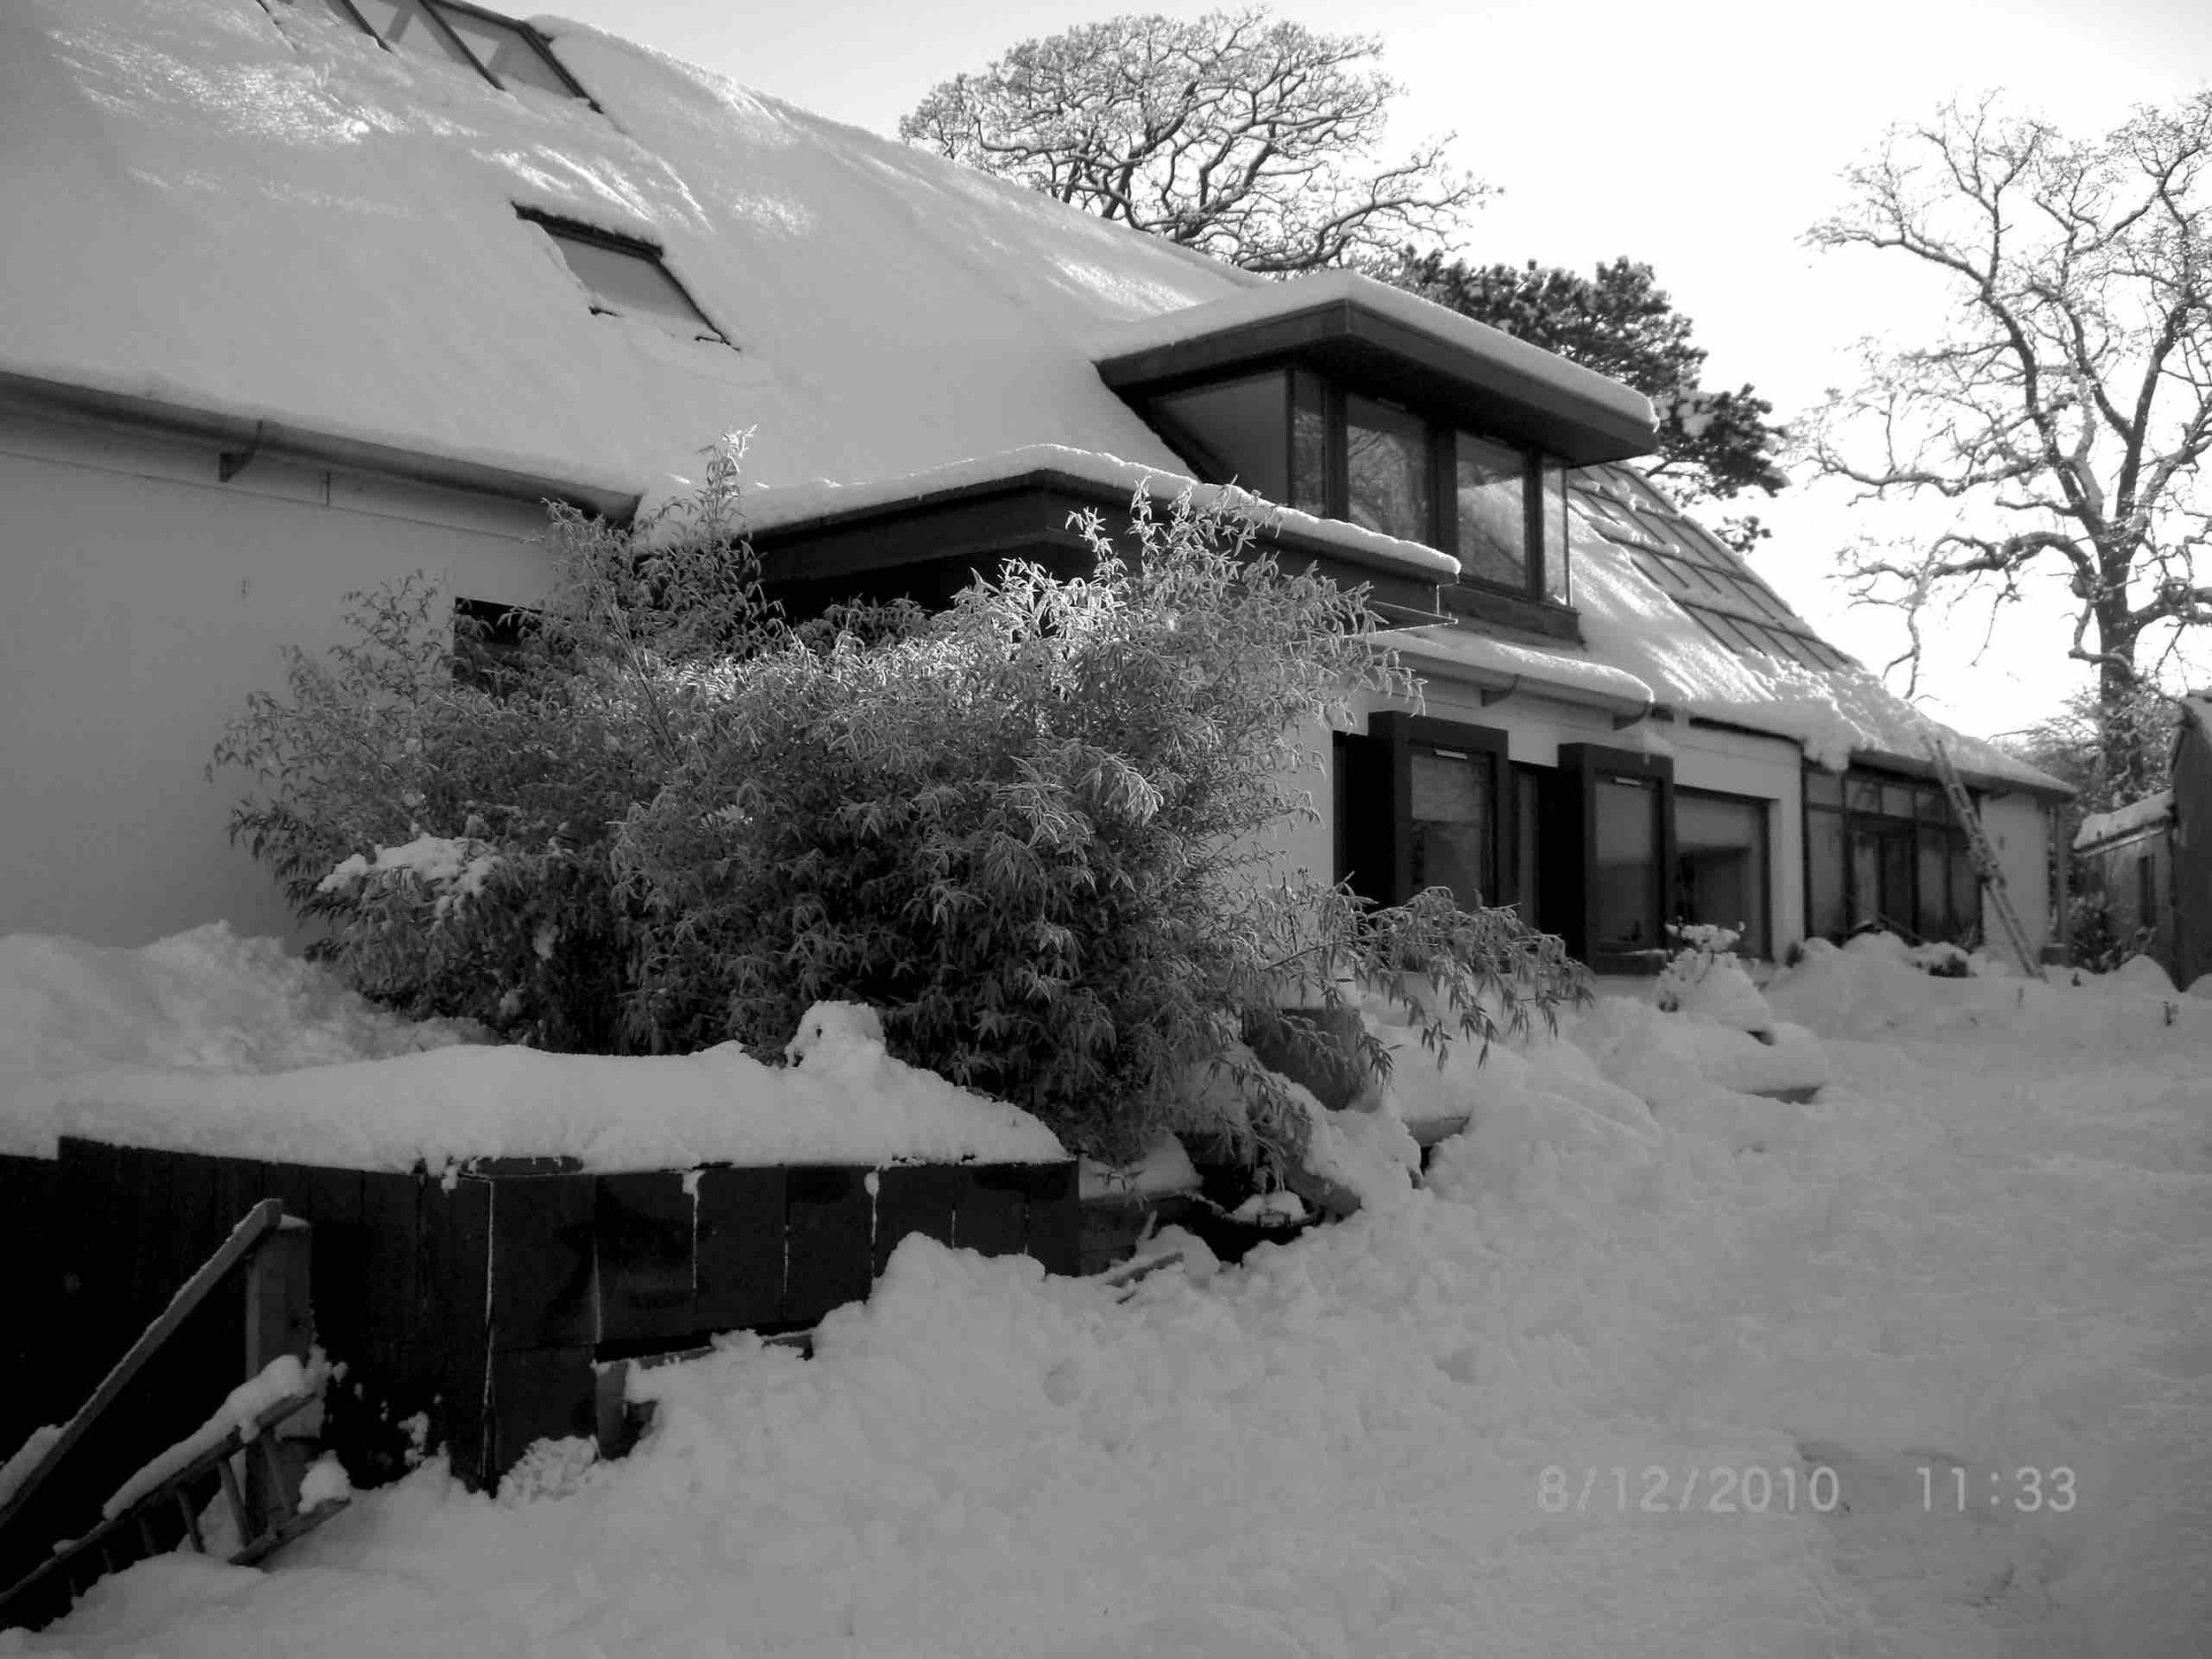 snow 2010 053 copy.jpg